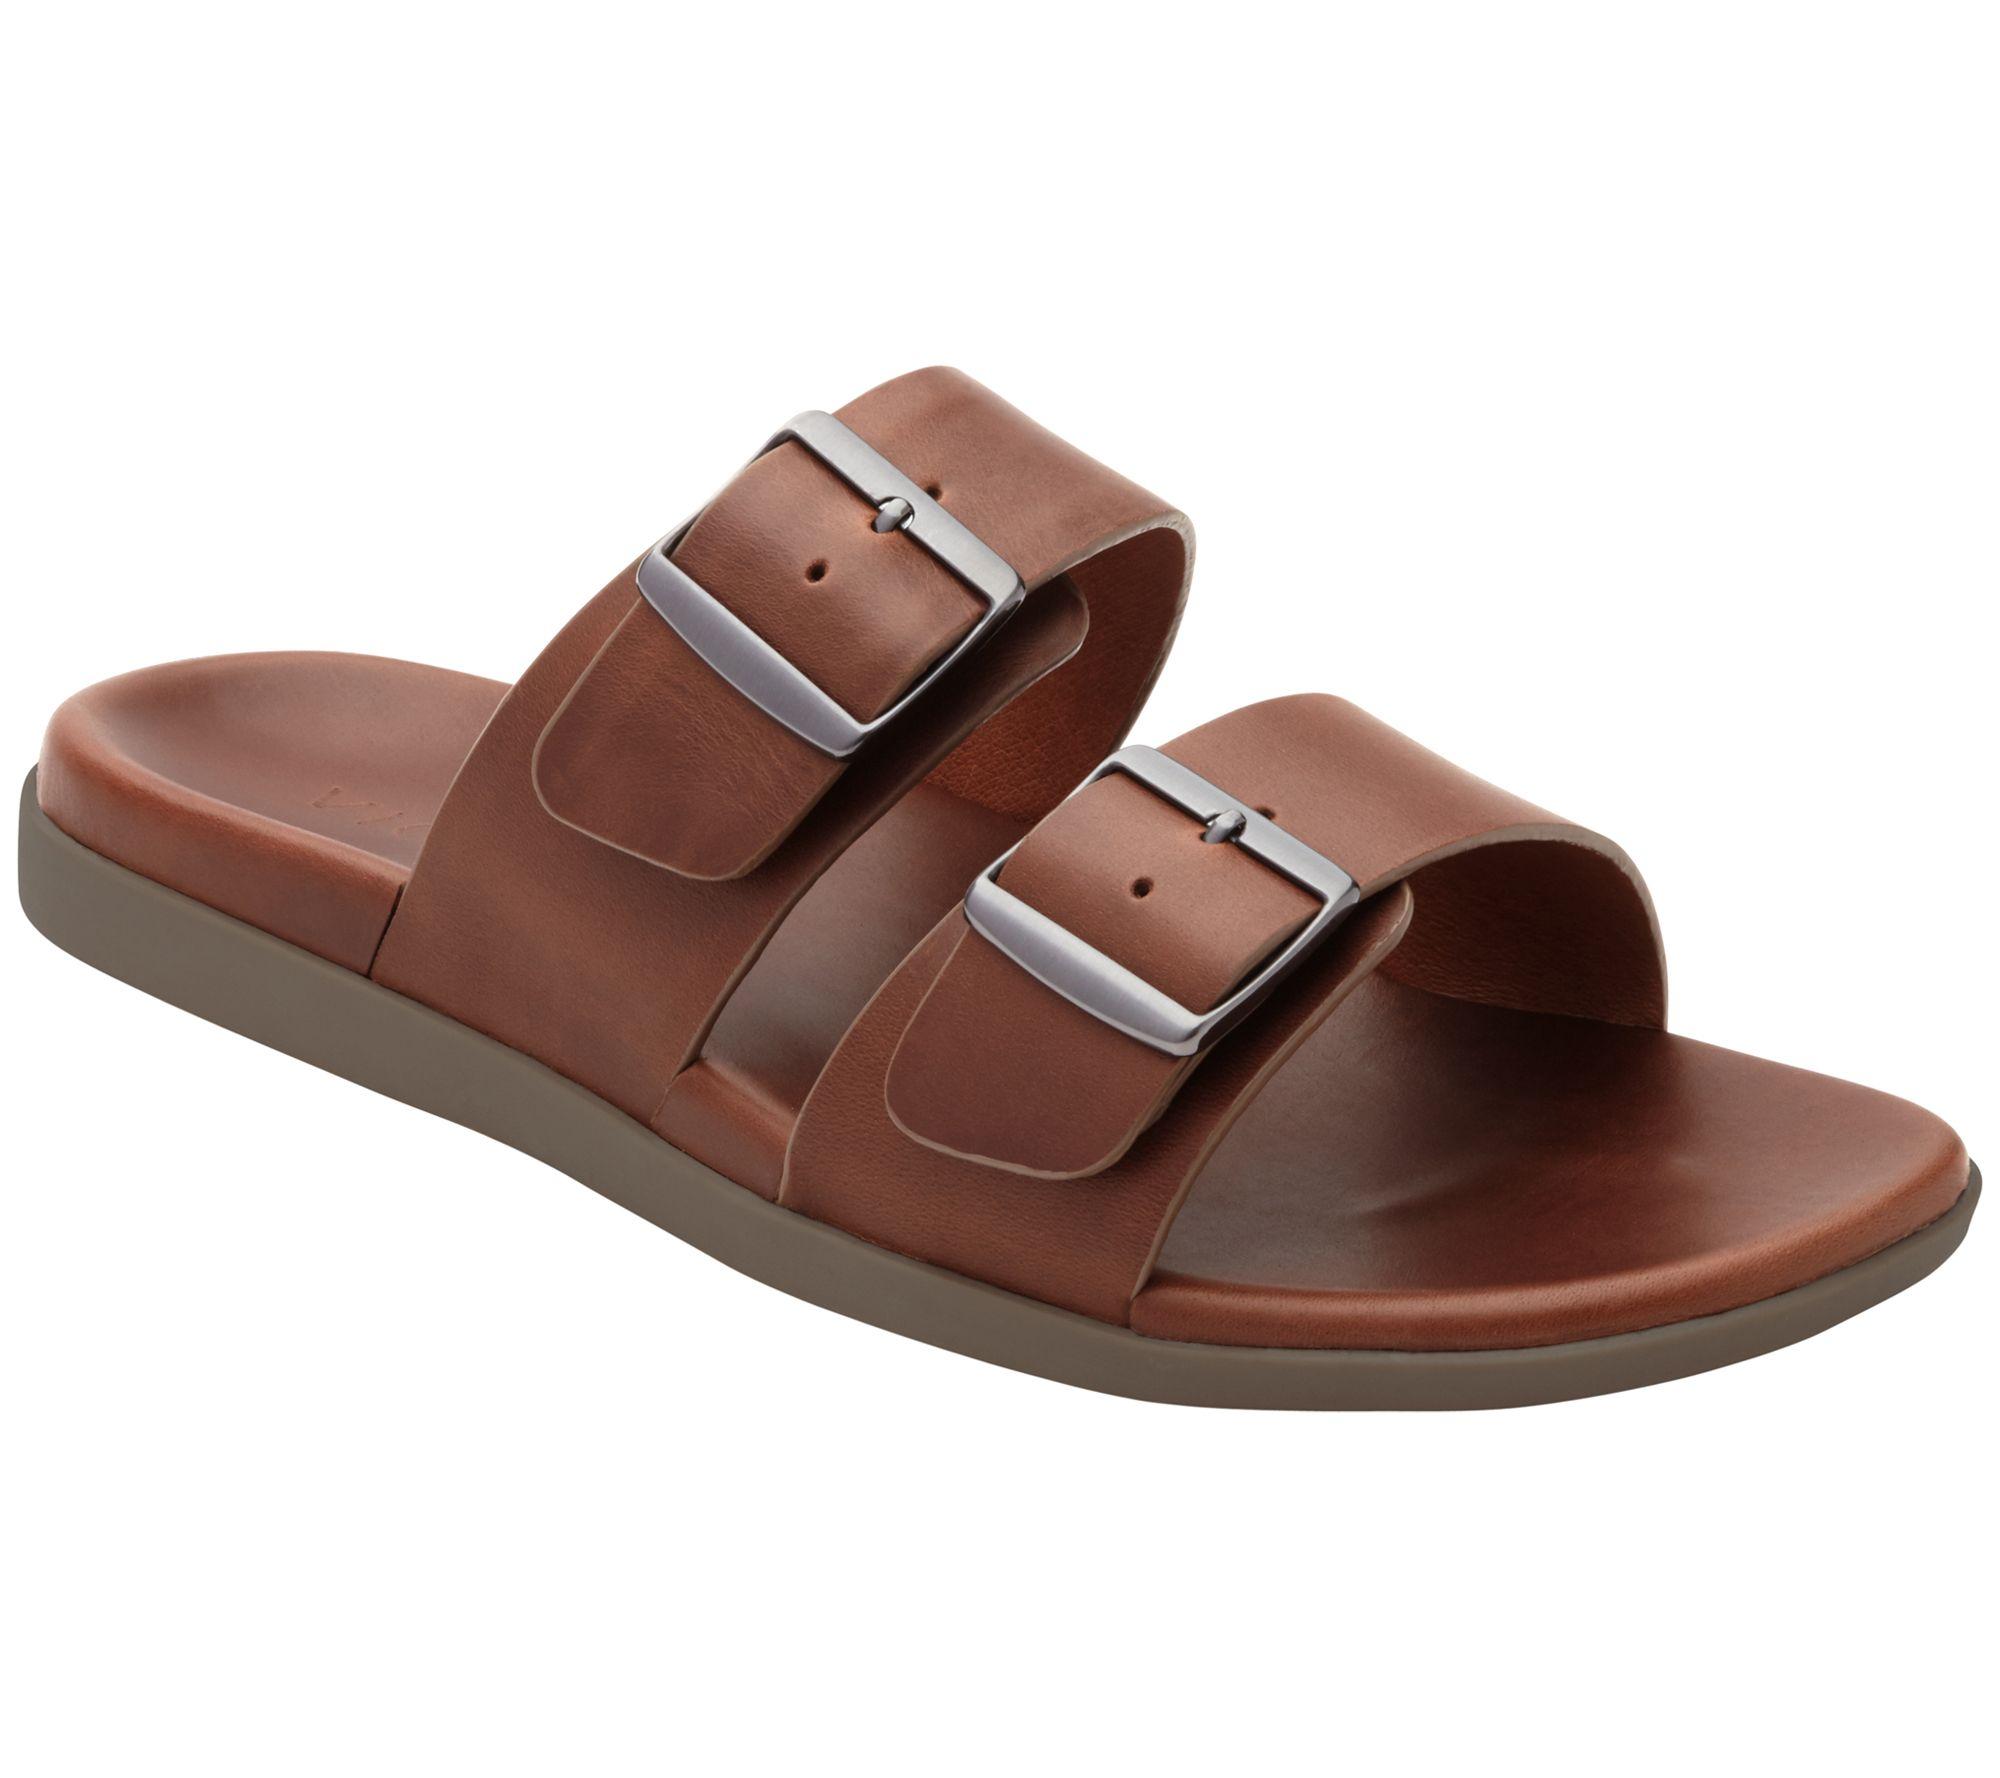 Vionic /'Leo/' Men/'s Arch Support Summer SandalsAdjustable Strap Style